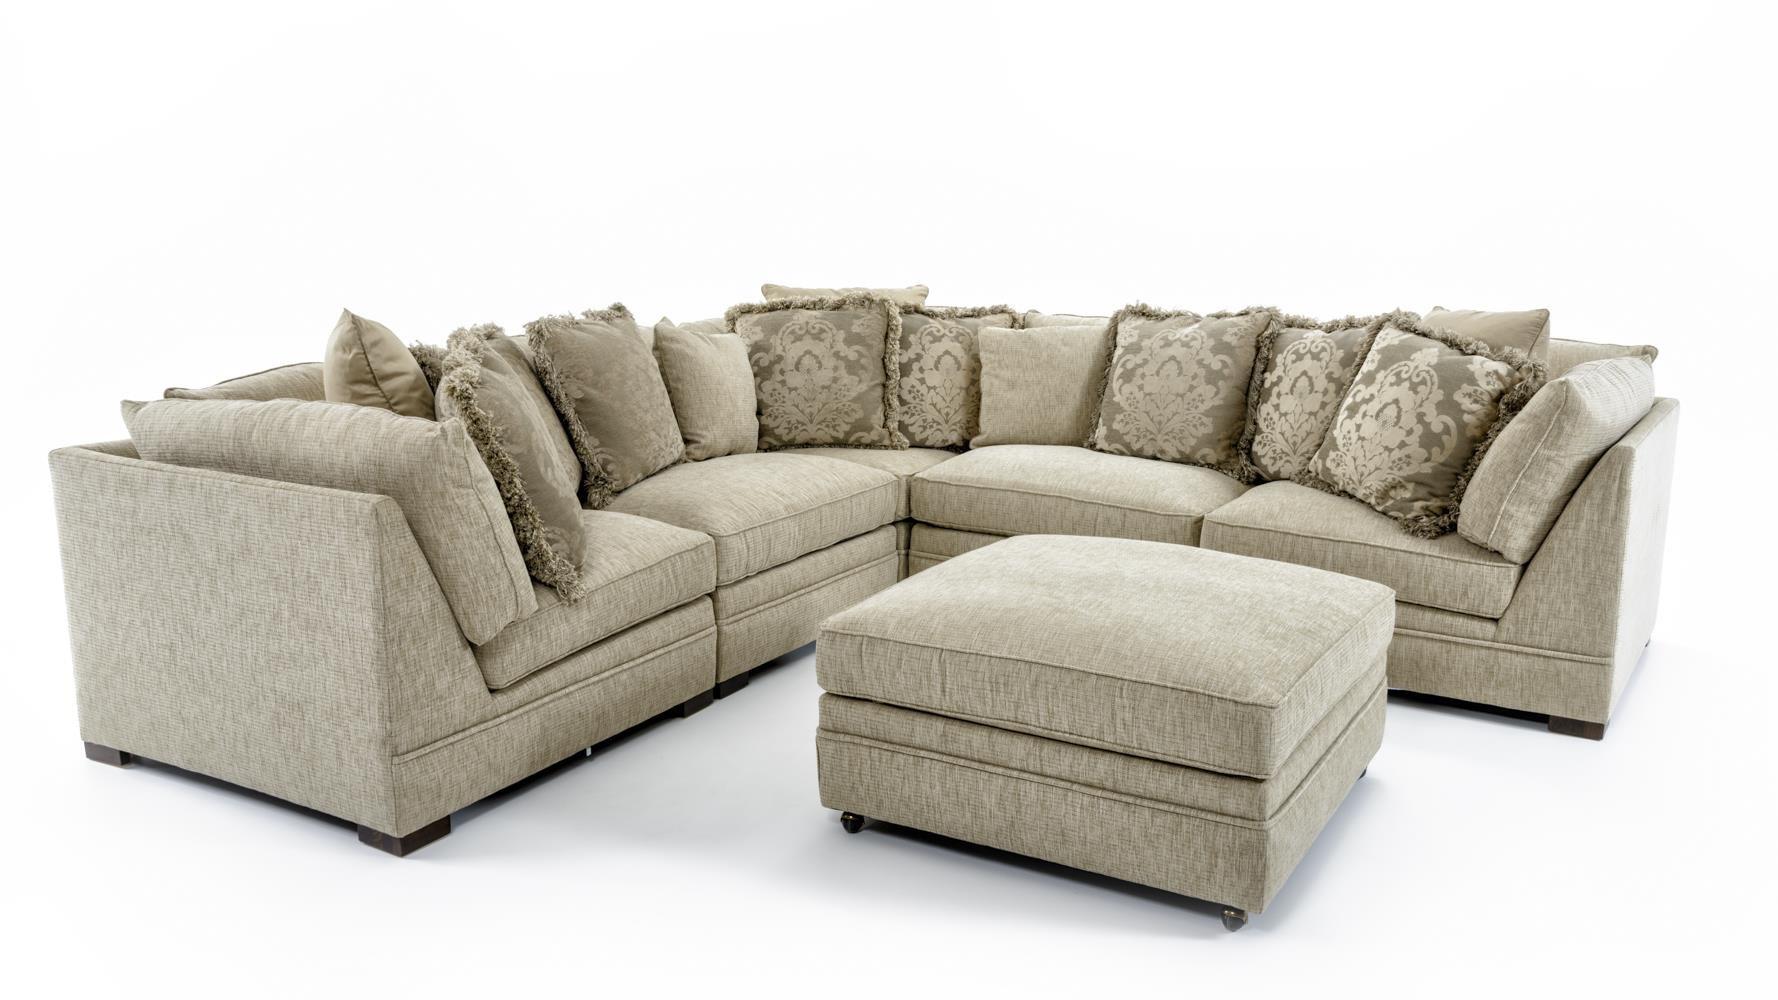 bernhardt sofa price list sure fit twill supreme 2 pc slipcover huntington house 7100 4x7100-51+7100-31 five piece corner ...